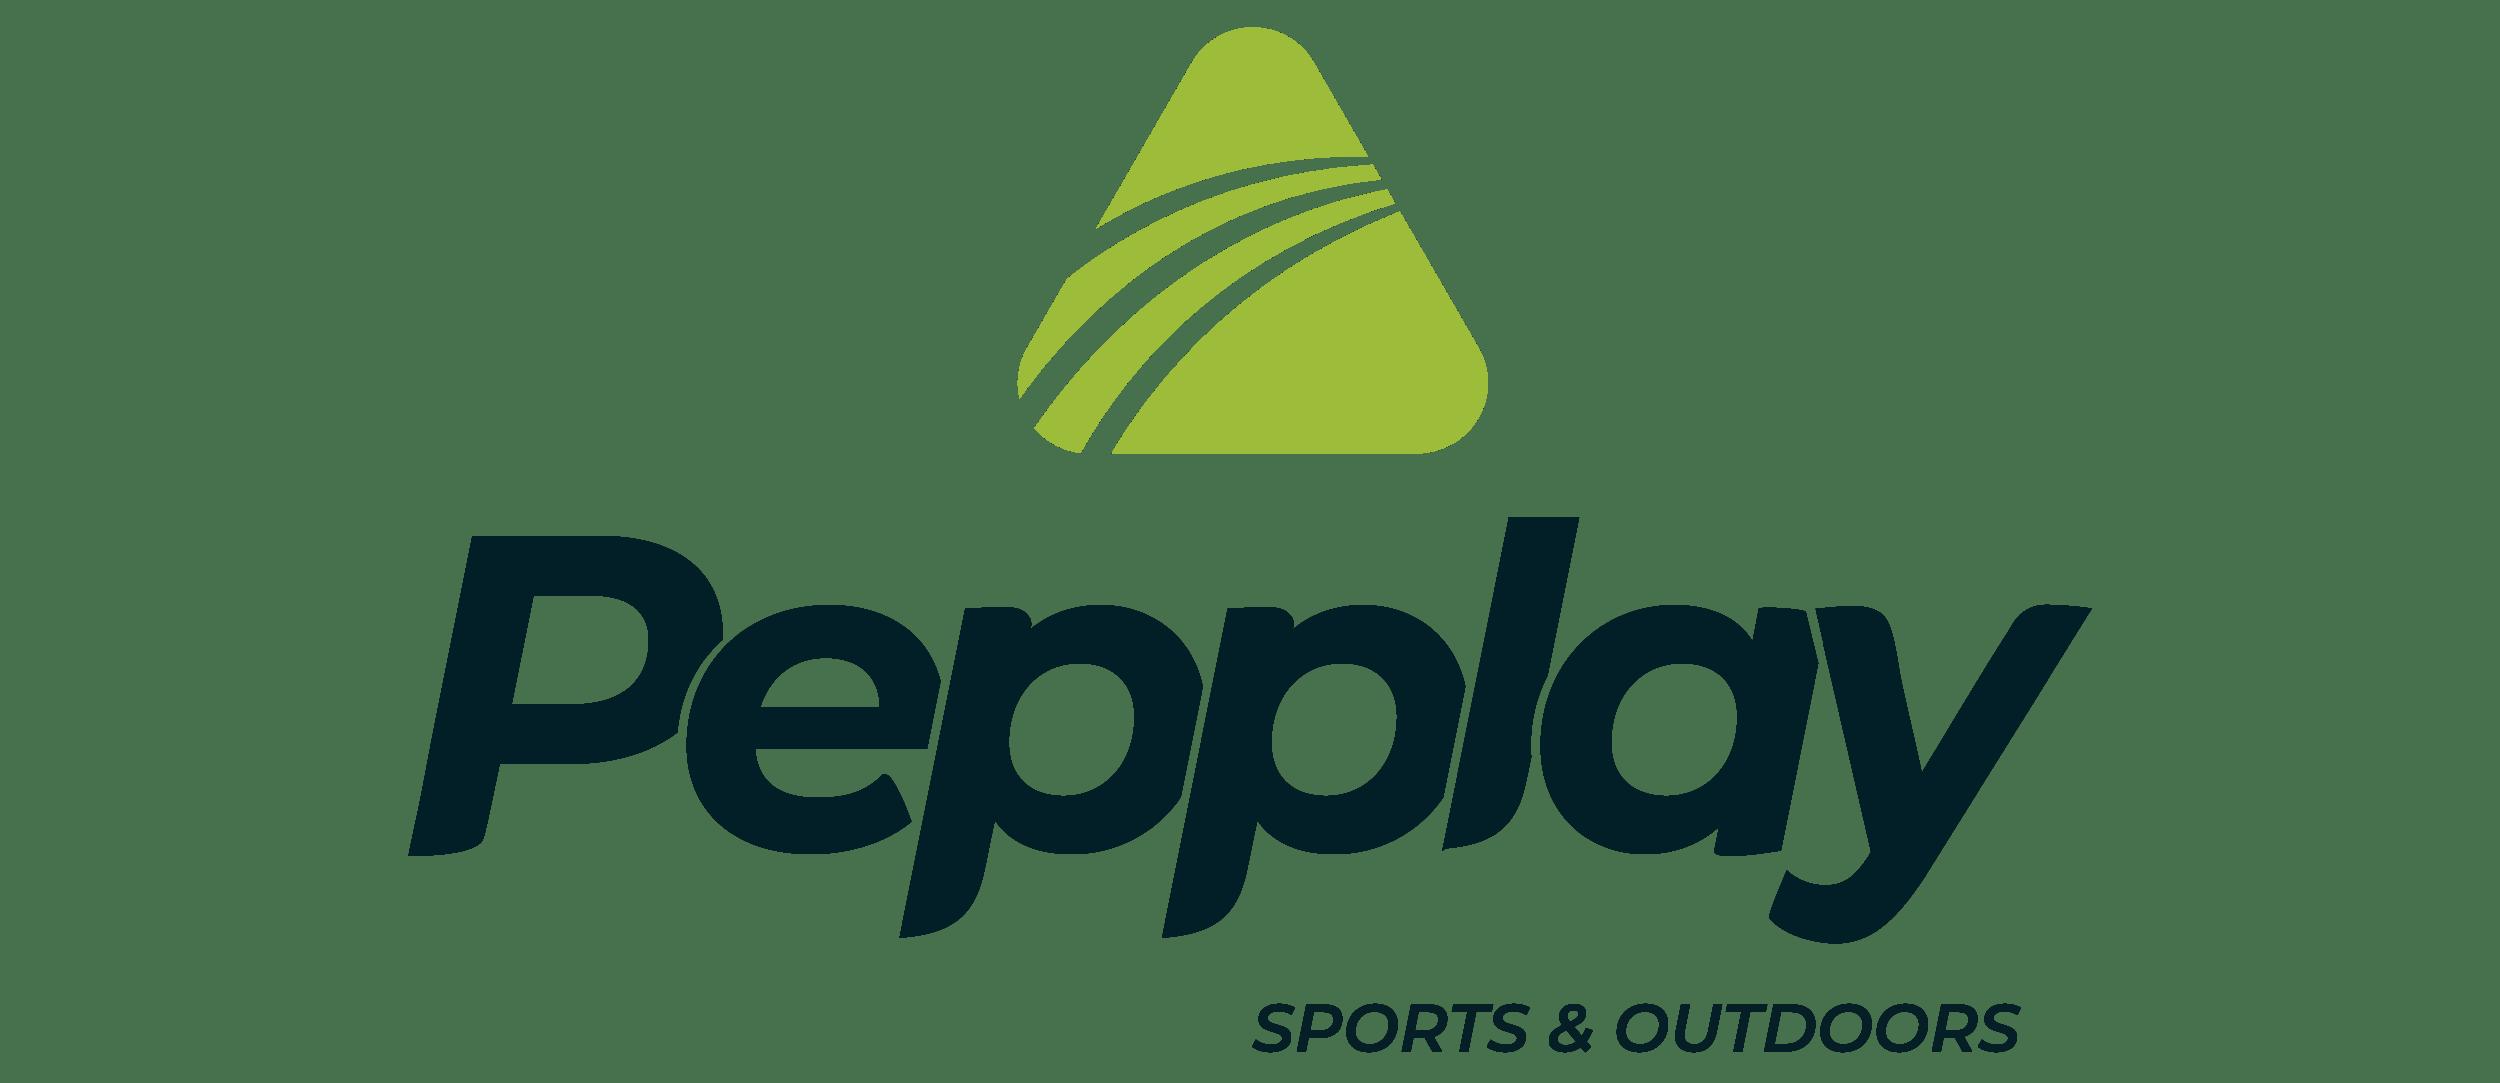 1a82317a1 Pepplay Sports   Outdoors - Loja de artigos esportivos